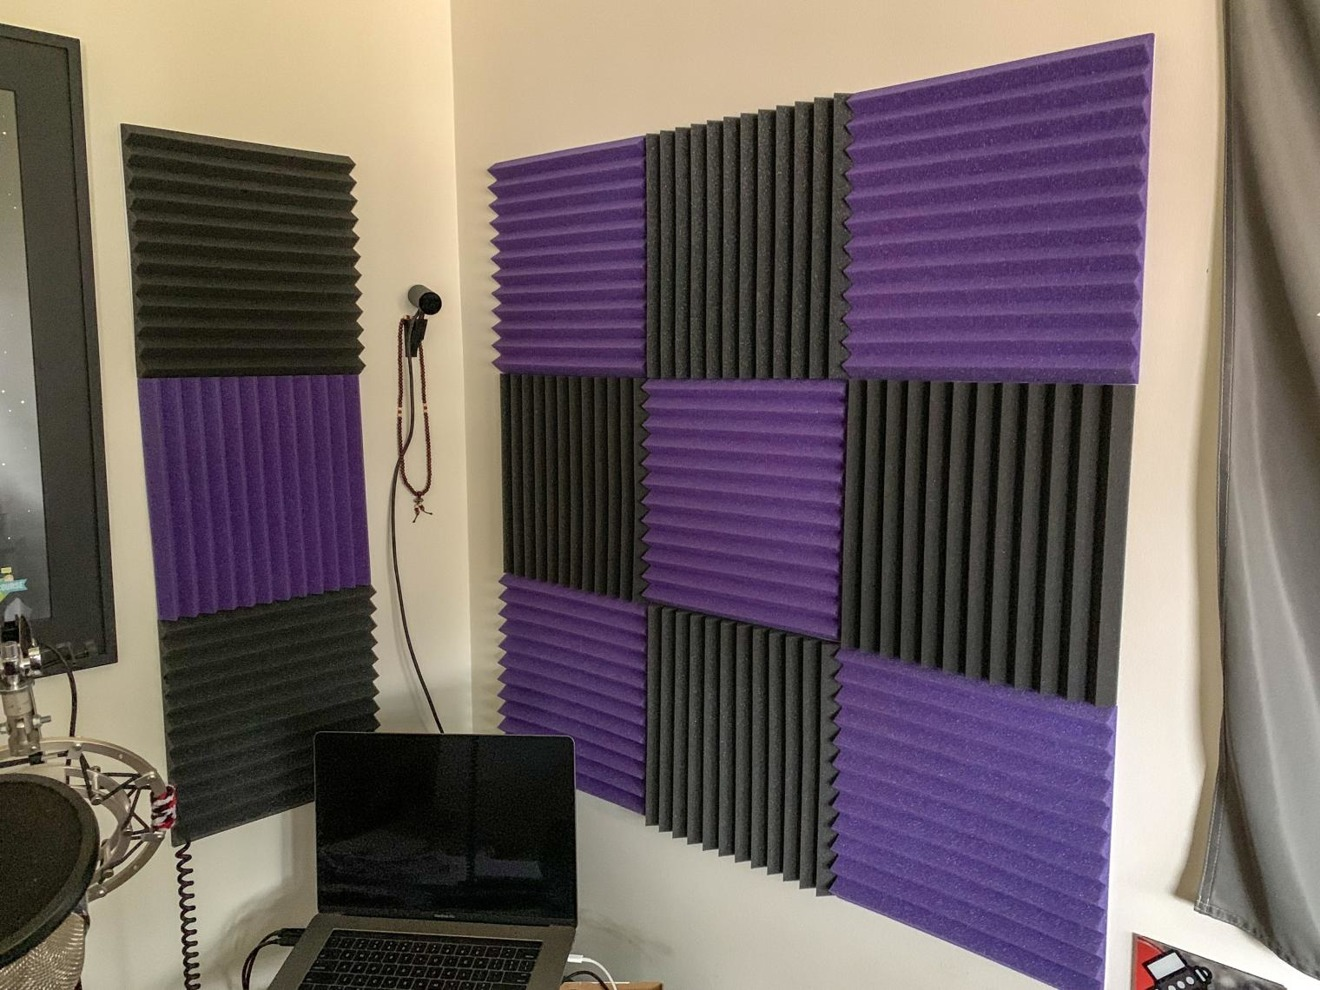 A DIY podcast studio